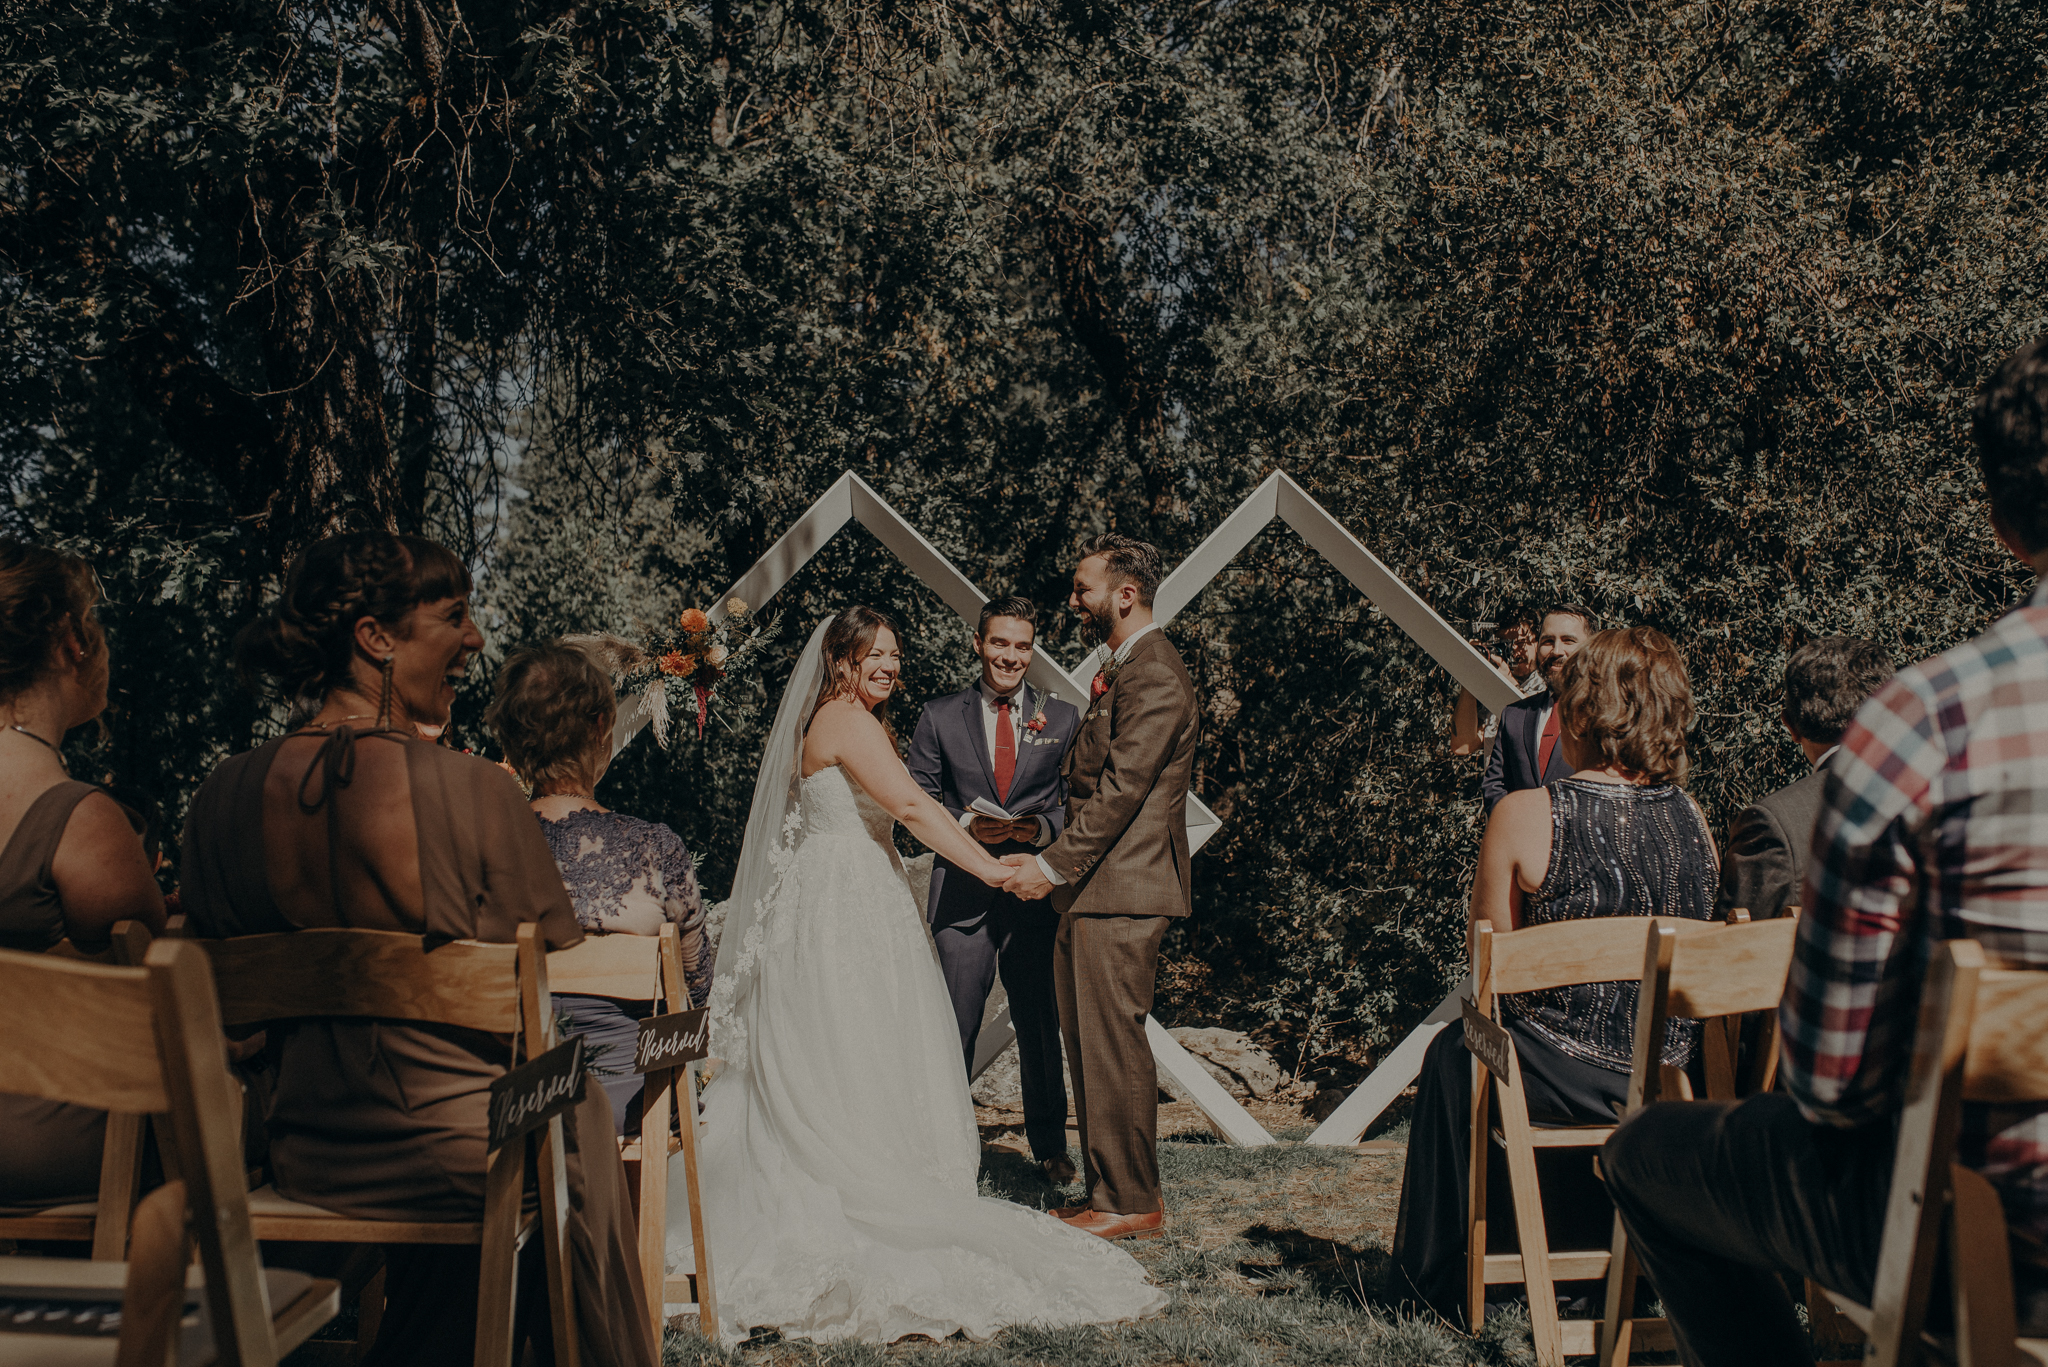 Yosemite Elopement Photographer - Evergreen Lodge Wedding Photographer - IsaiahAndTaylor.com-099.jpg